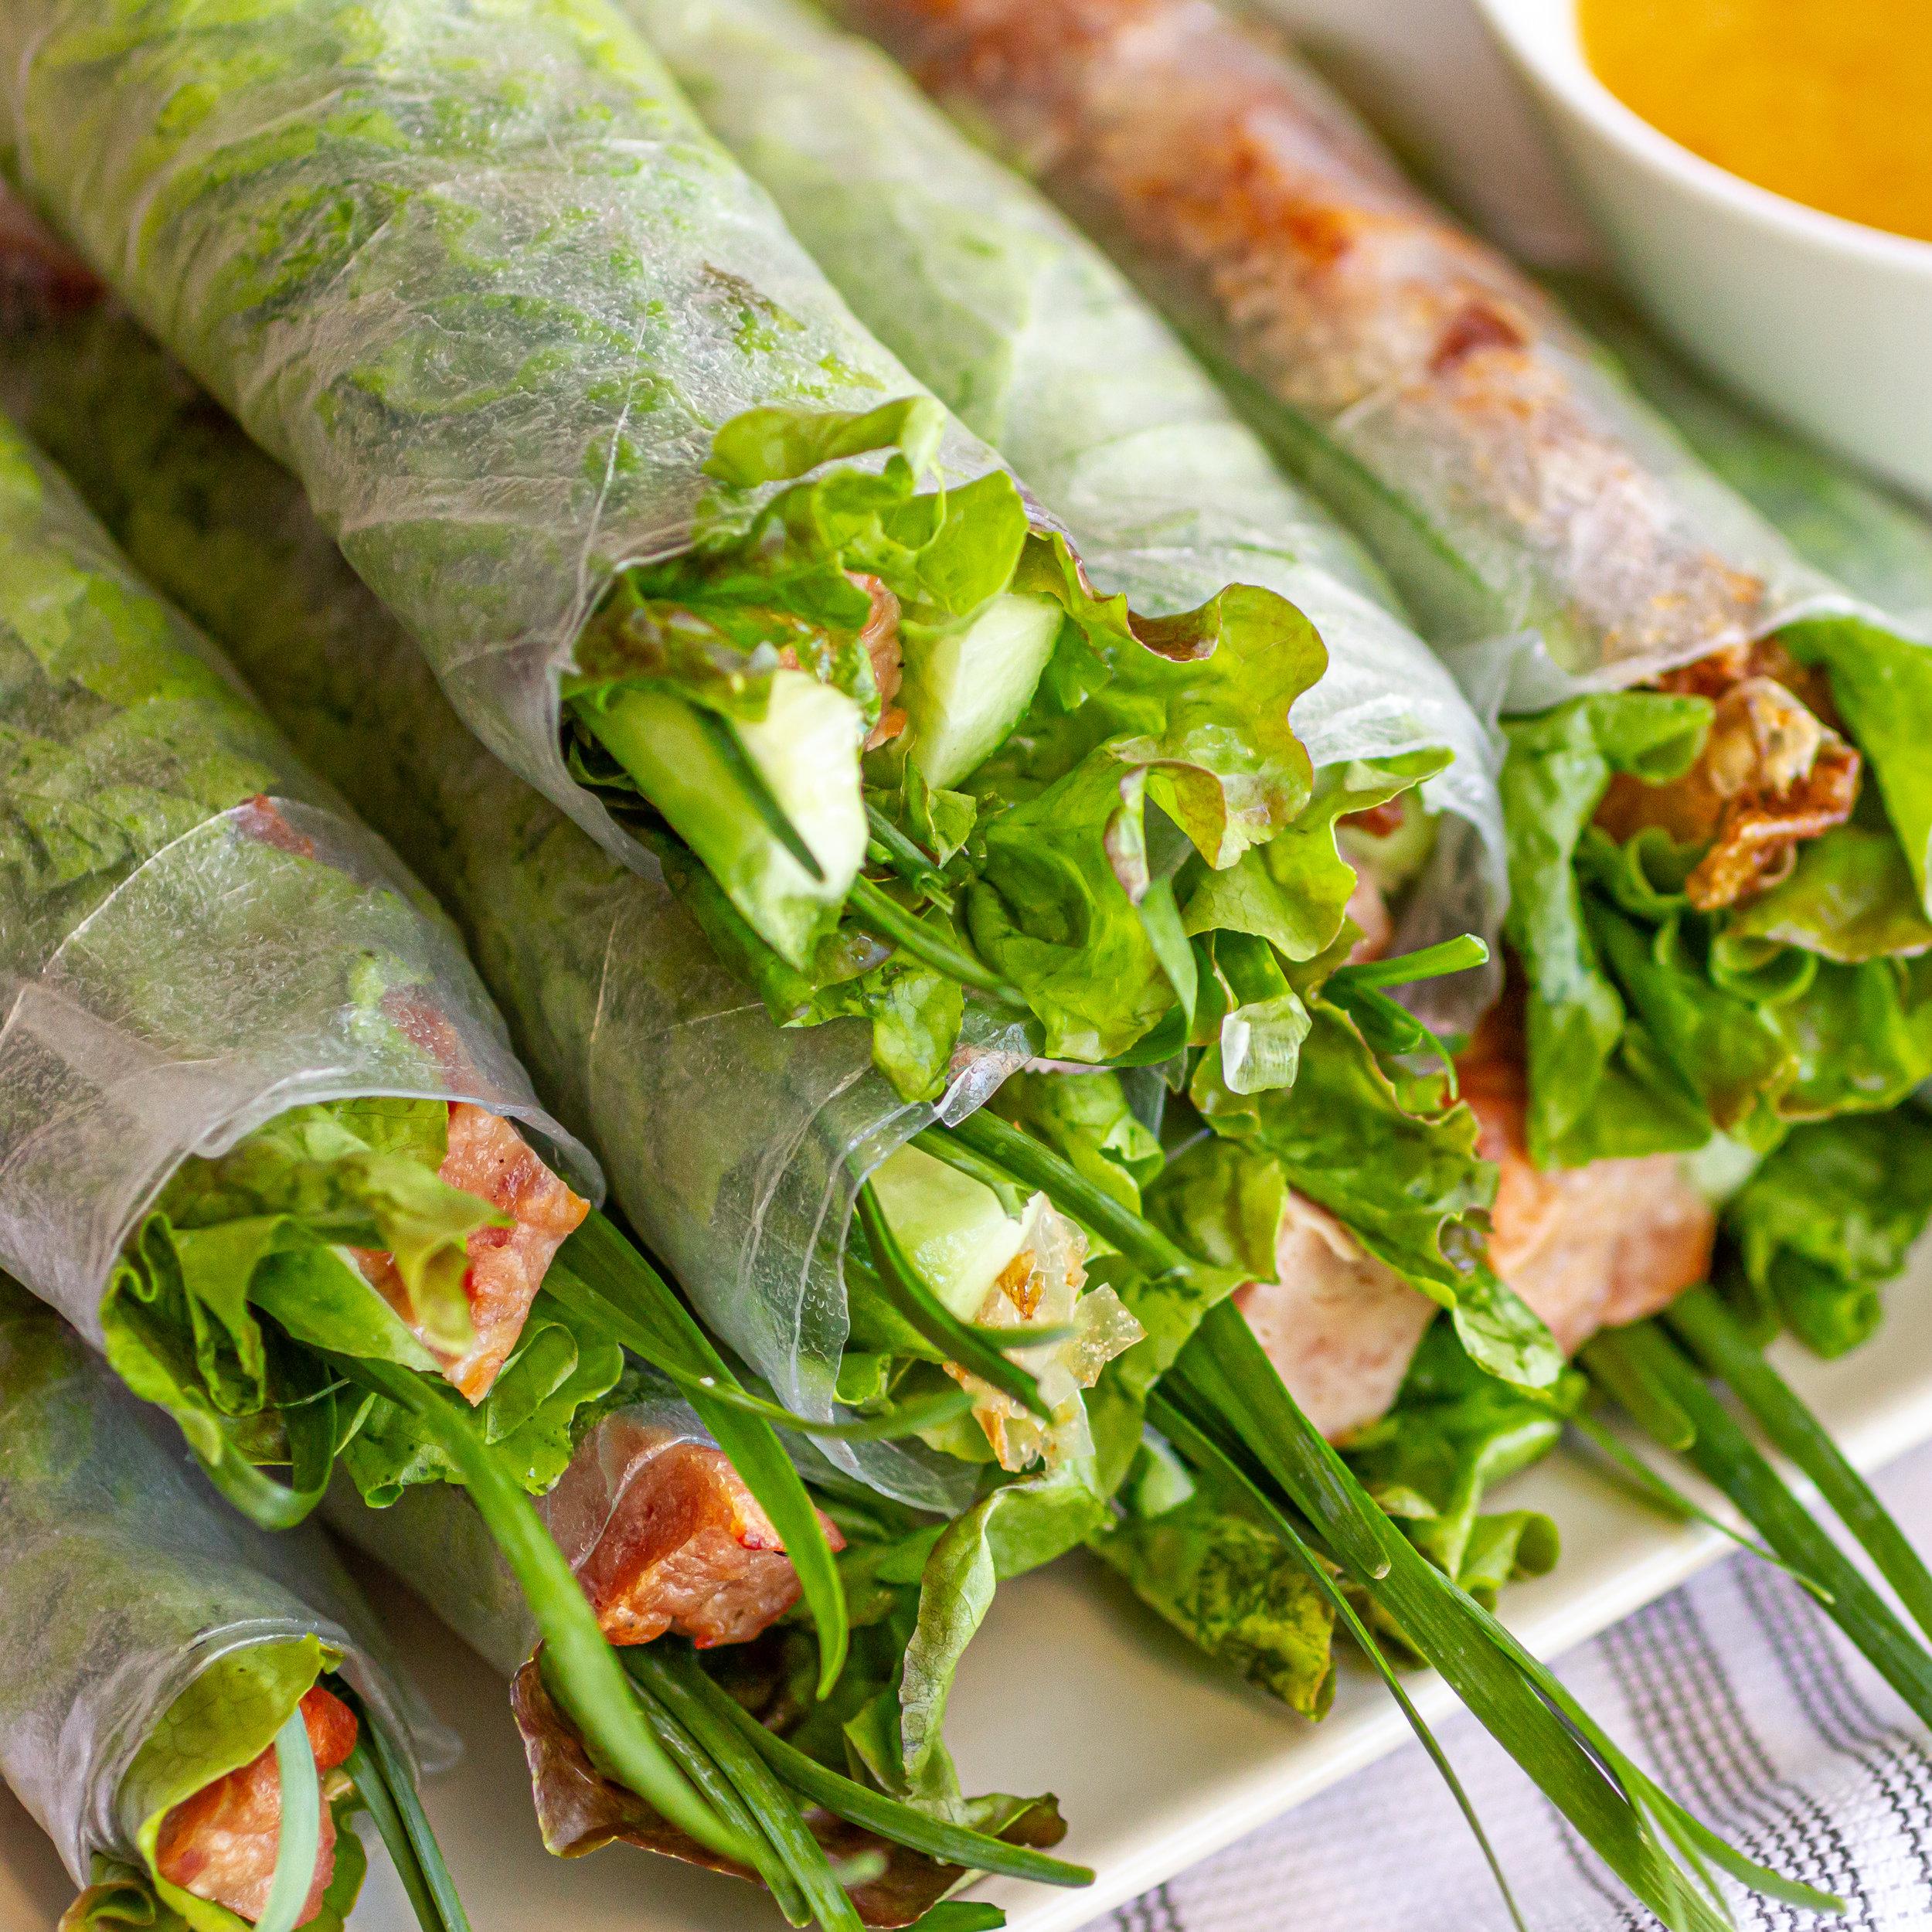 Vietnamese Grilled/Baked Pork Sausage Spring Rolls with Orange Dipping Sauce (Nem Nuong Nha Trang)